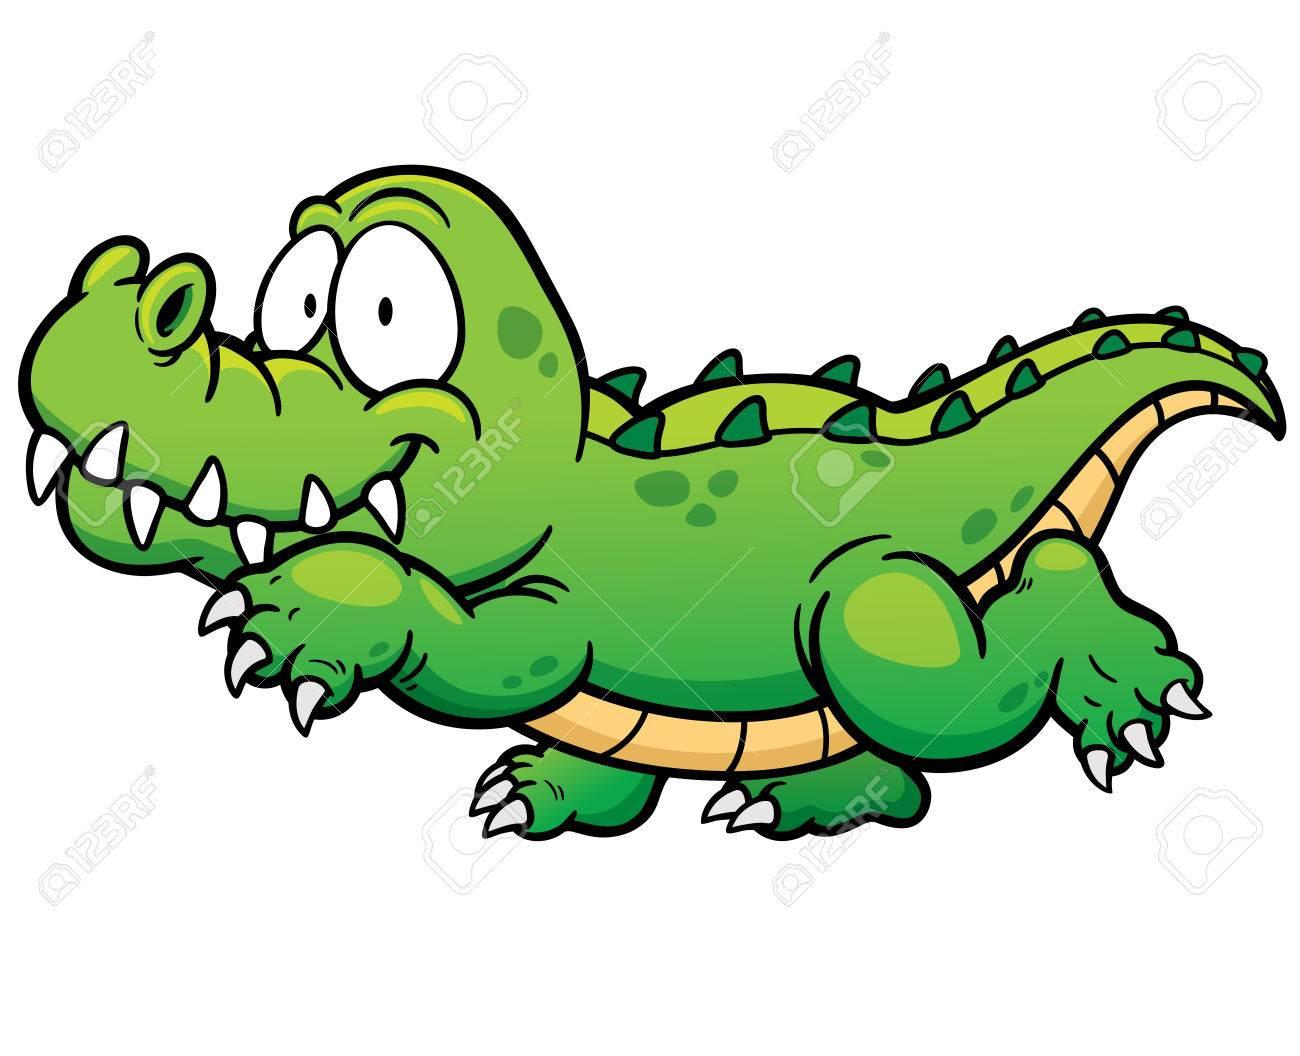 1300x1056 Vector Illustration Of Cartoon Crocodile Royalty Free Cliparts